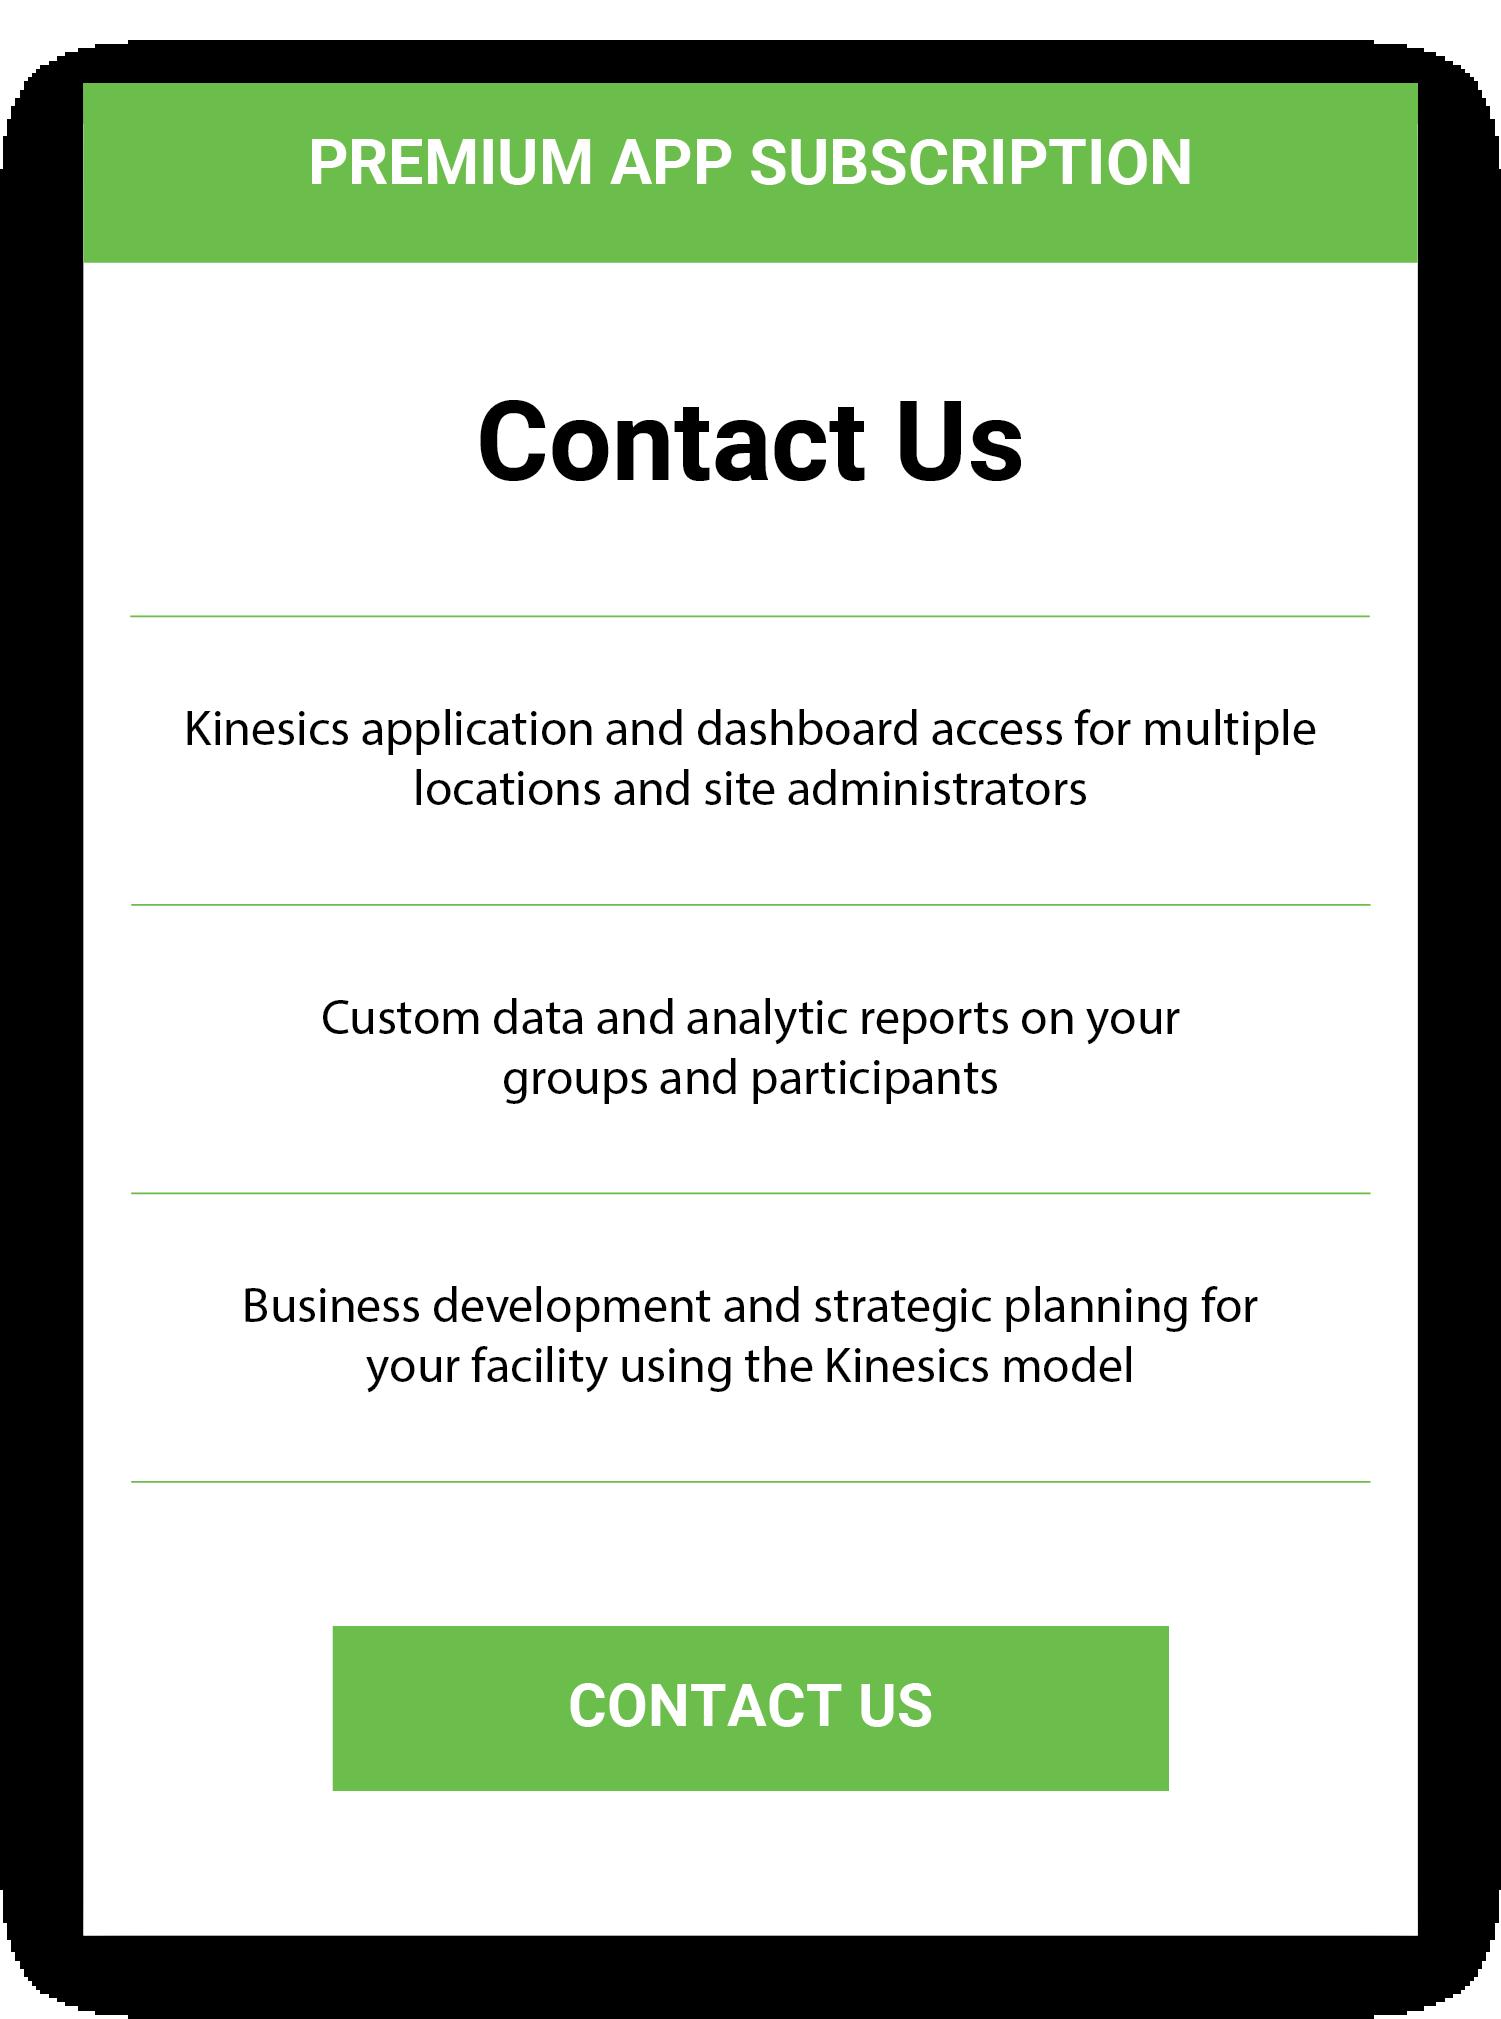 Kinesics_WebsiteImages_Pricing_20190624-03.png